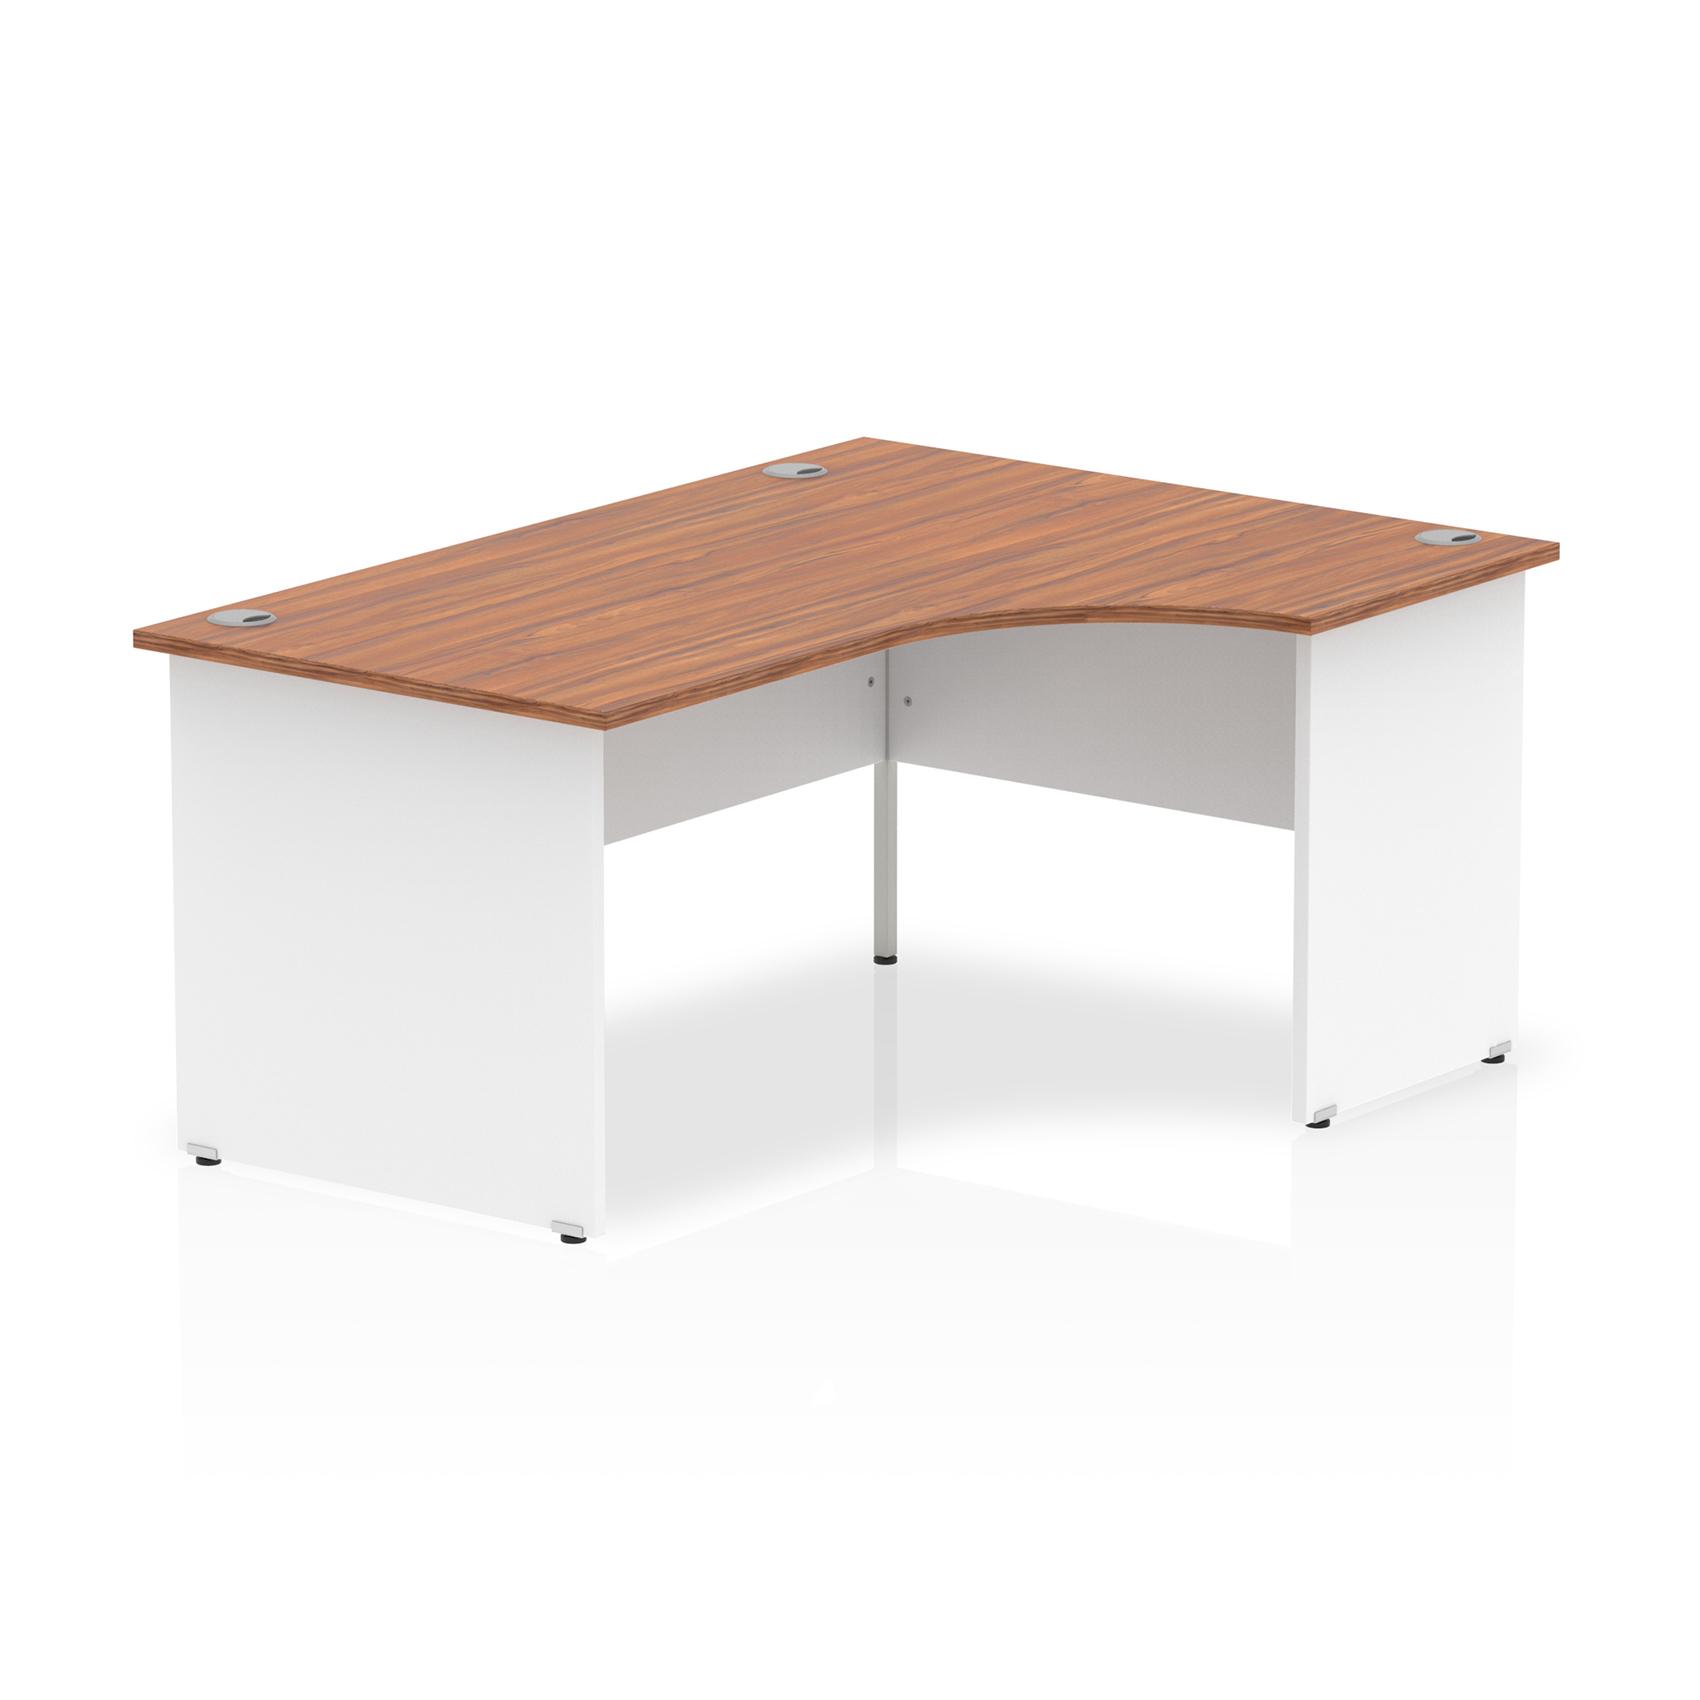 Trexus Desk Crescent Right Hand Panel End 1600x800mm Walnut Top White Panels Ref TT000037